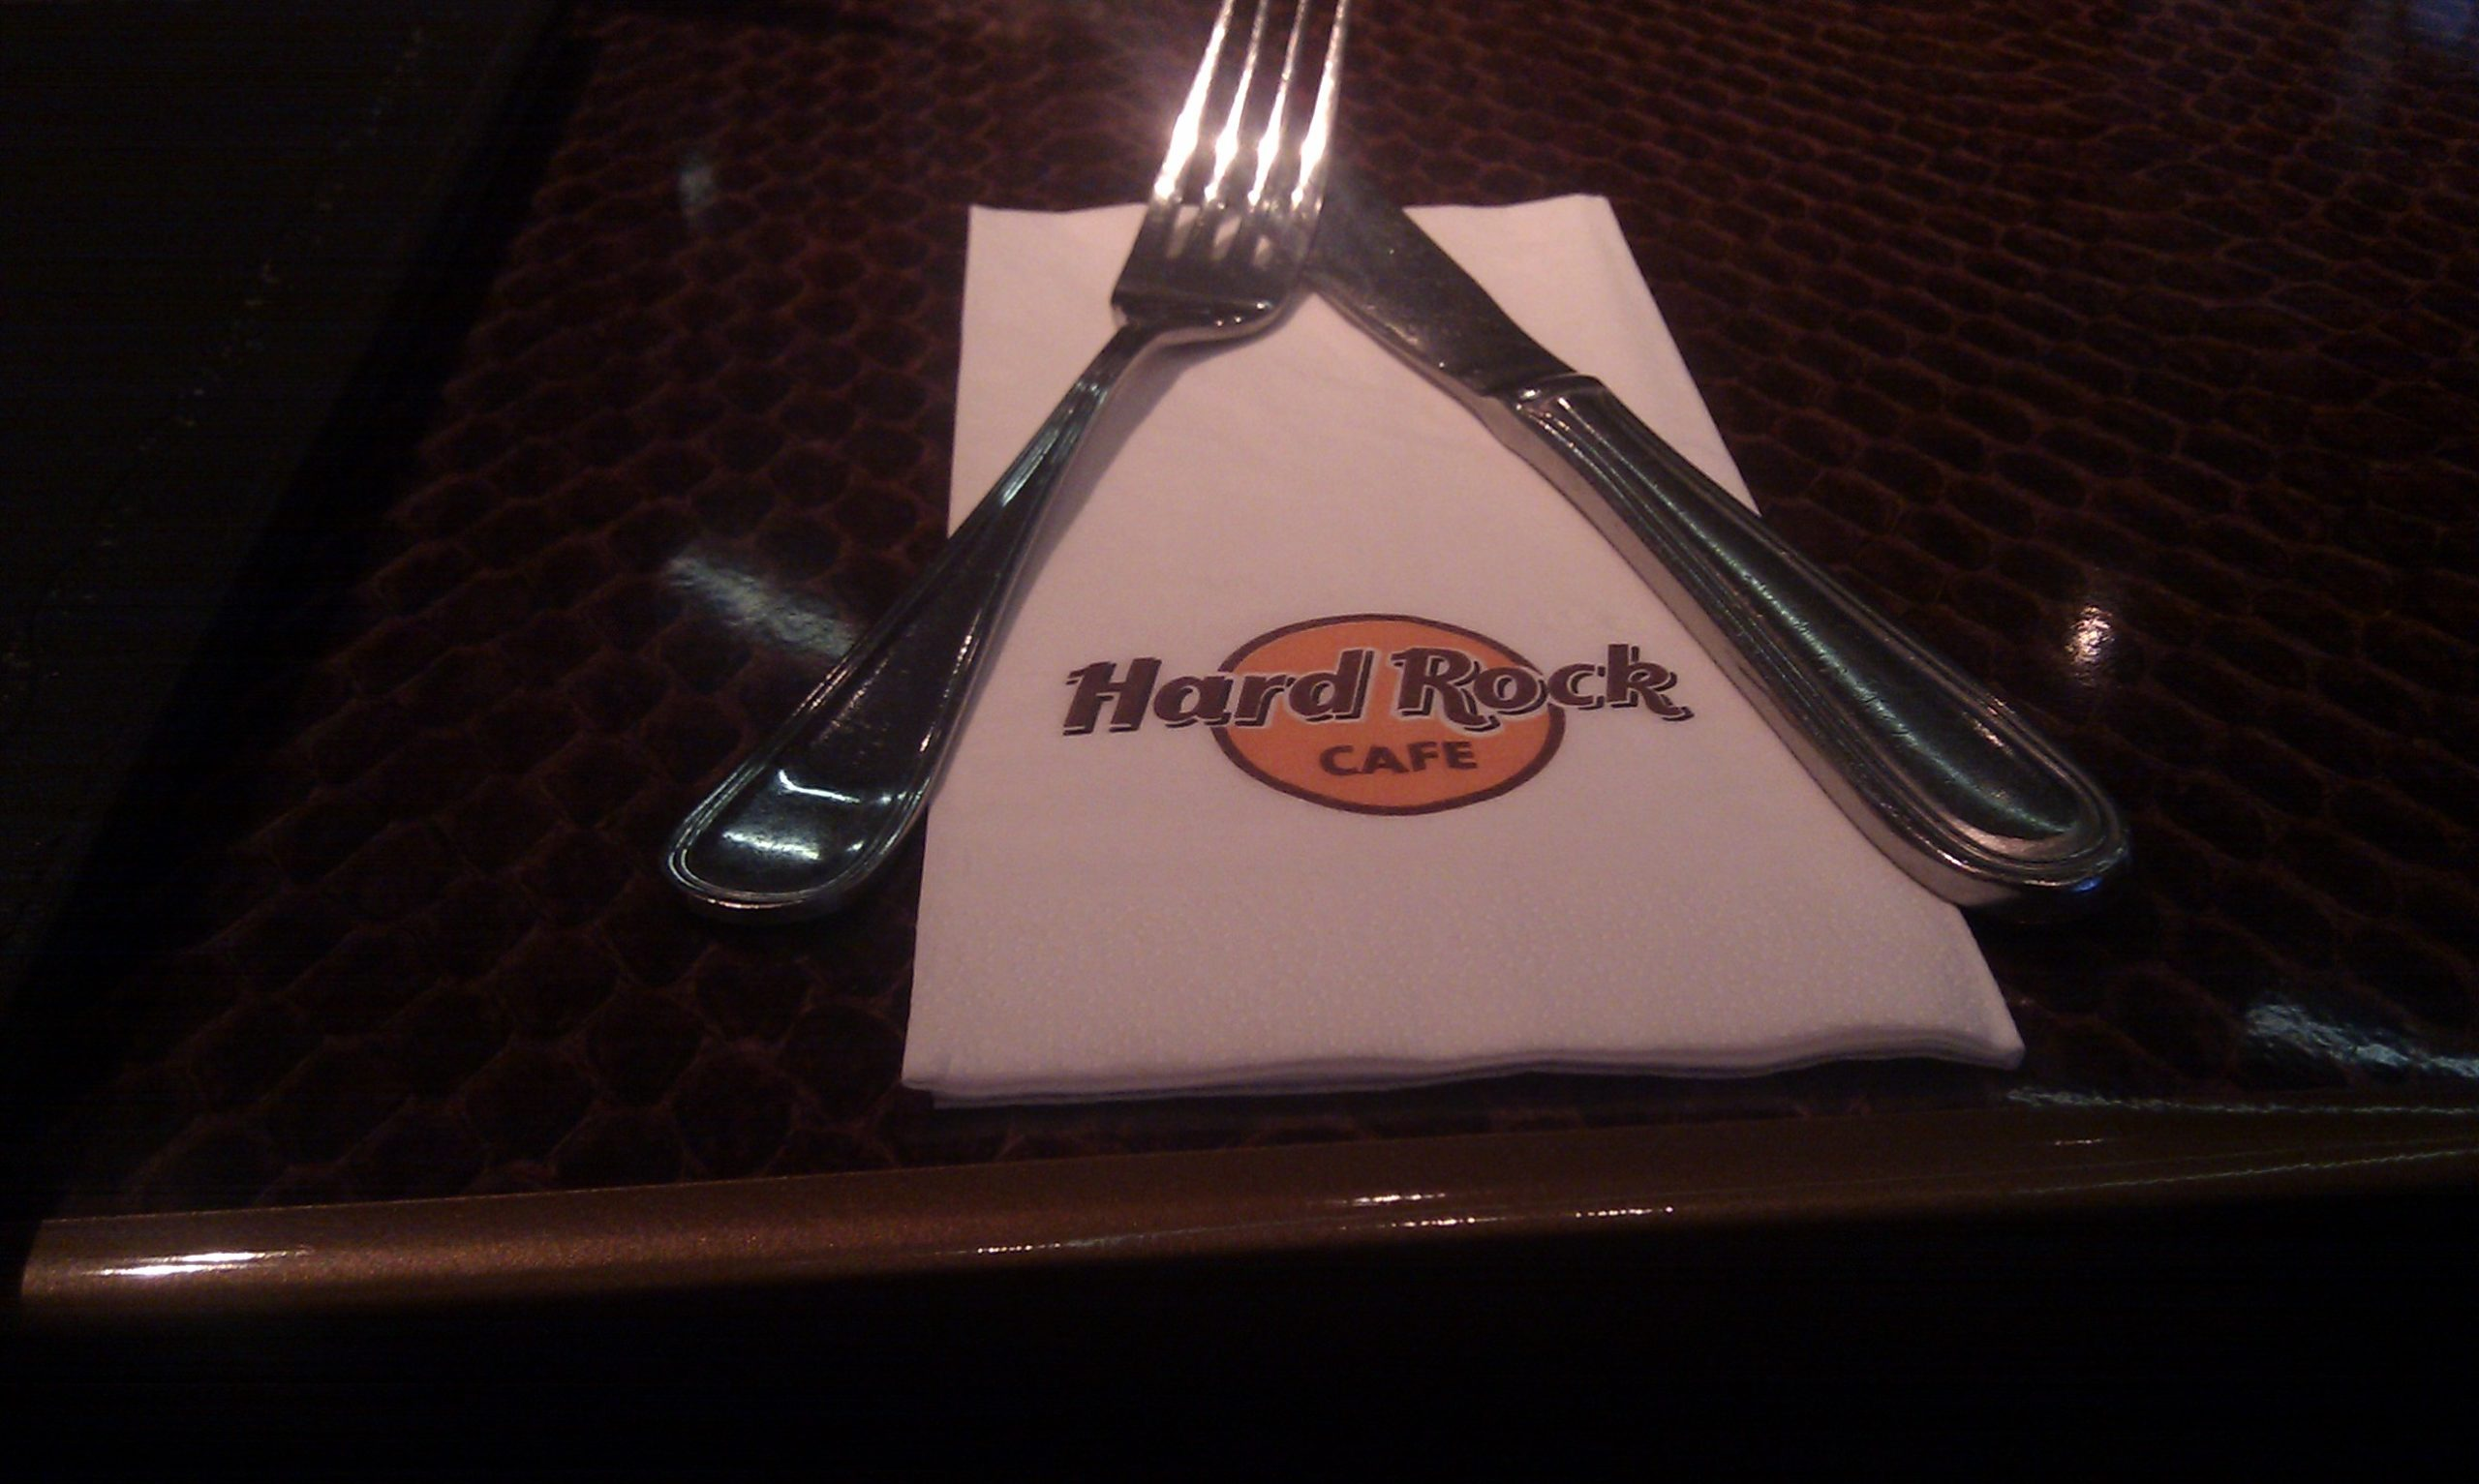 Hard Rock cafe salvetes